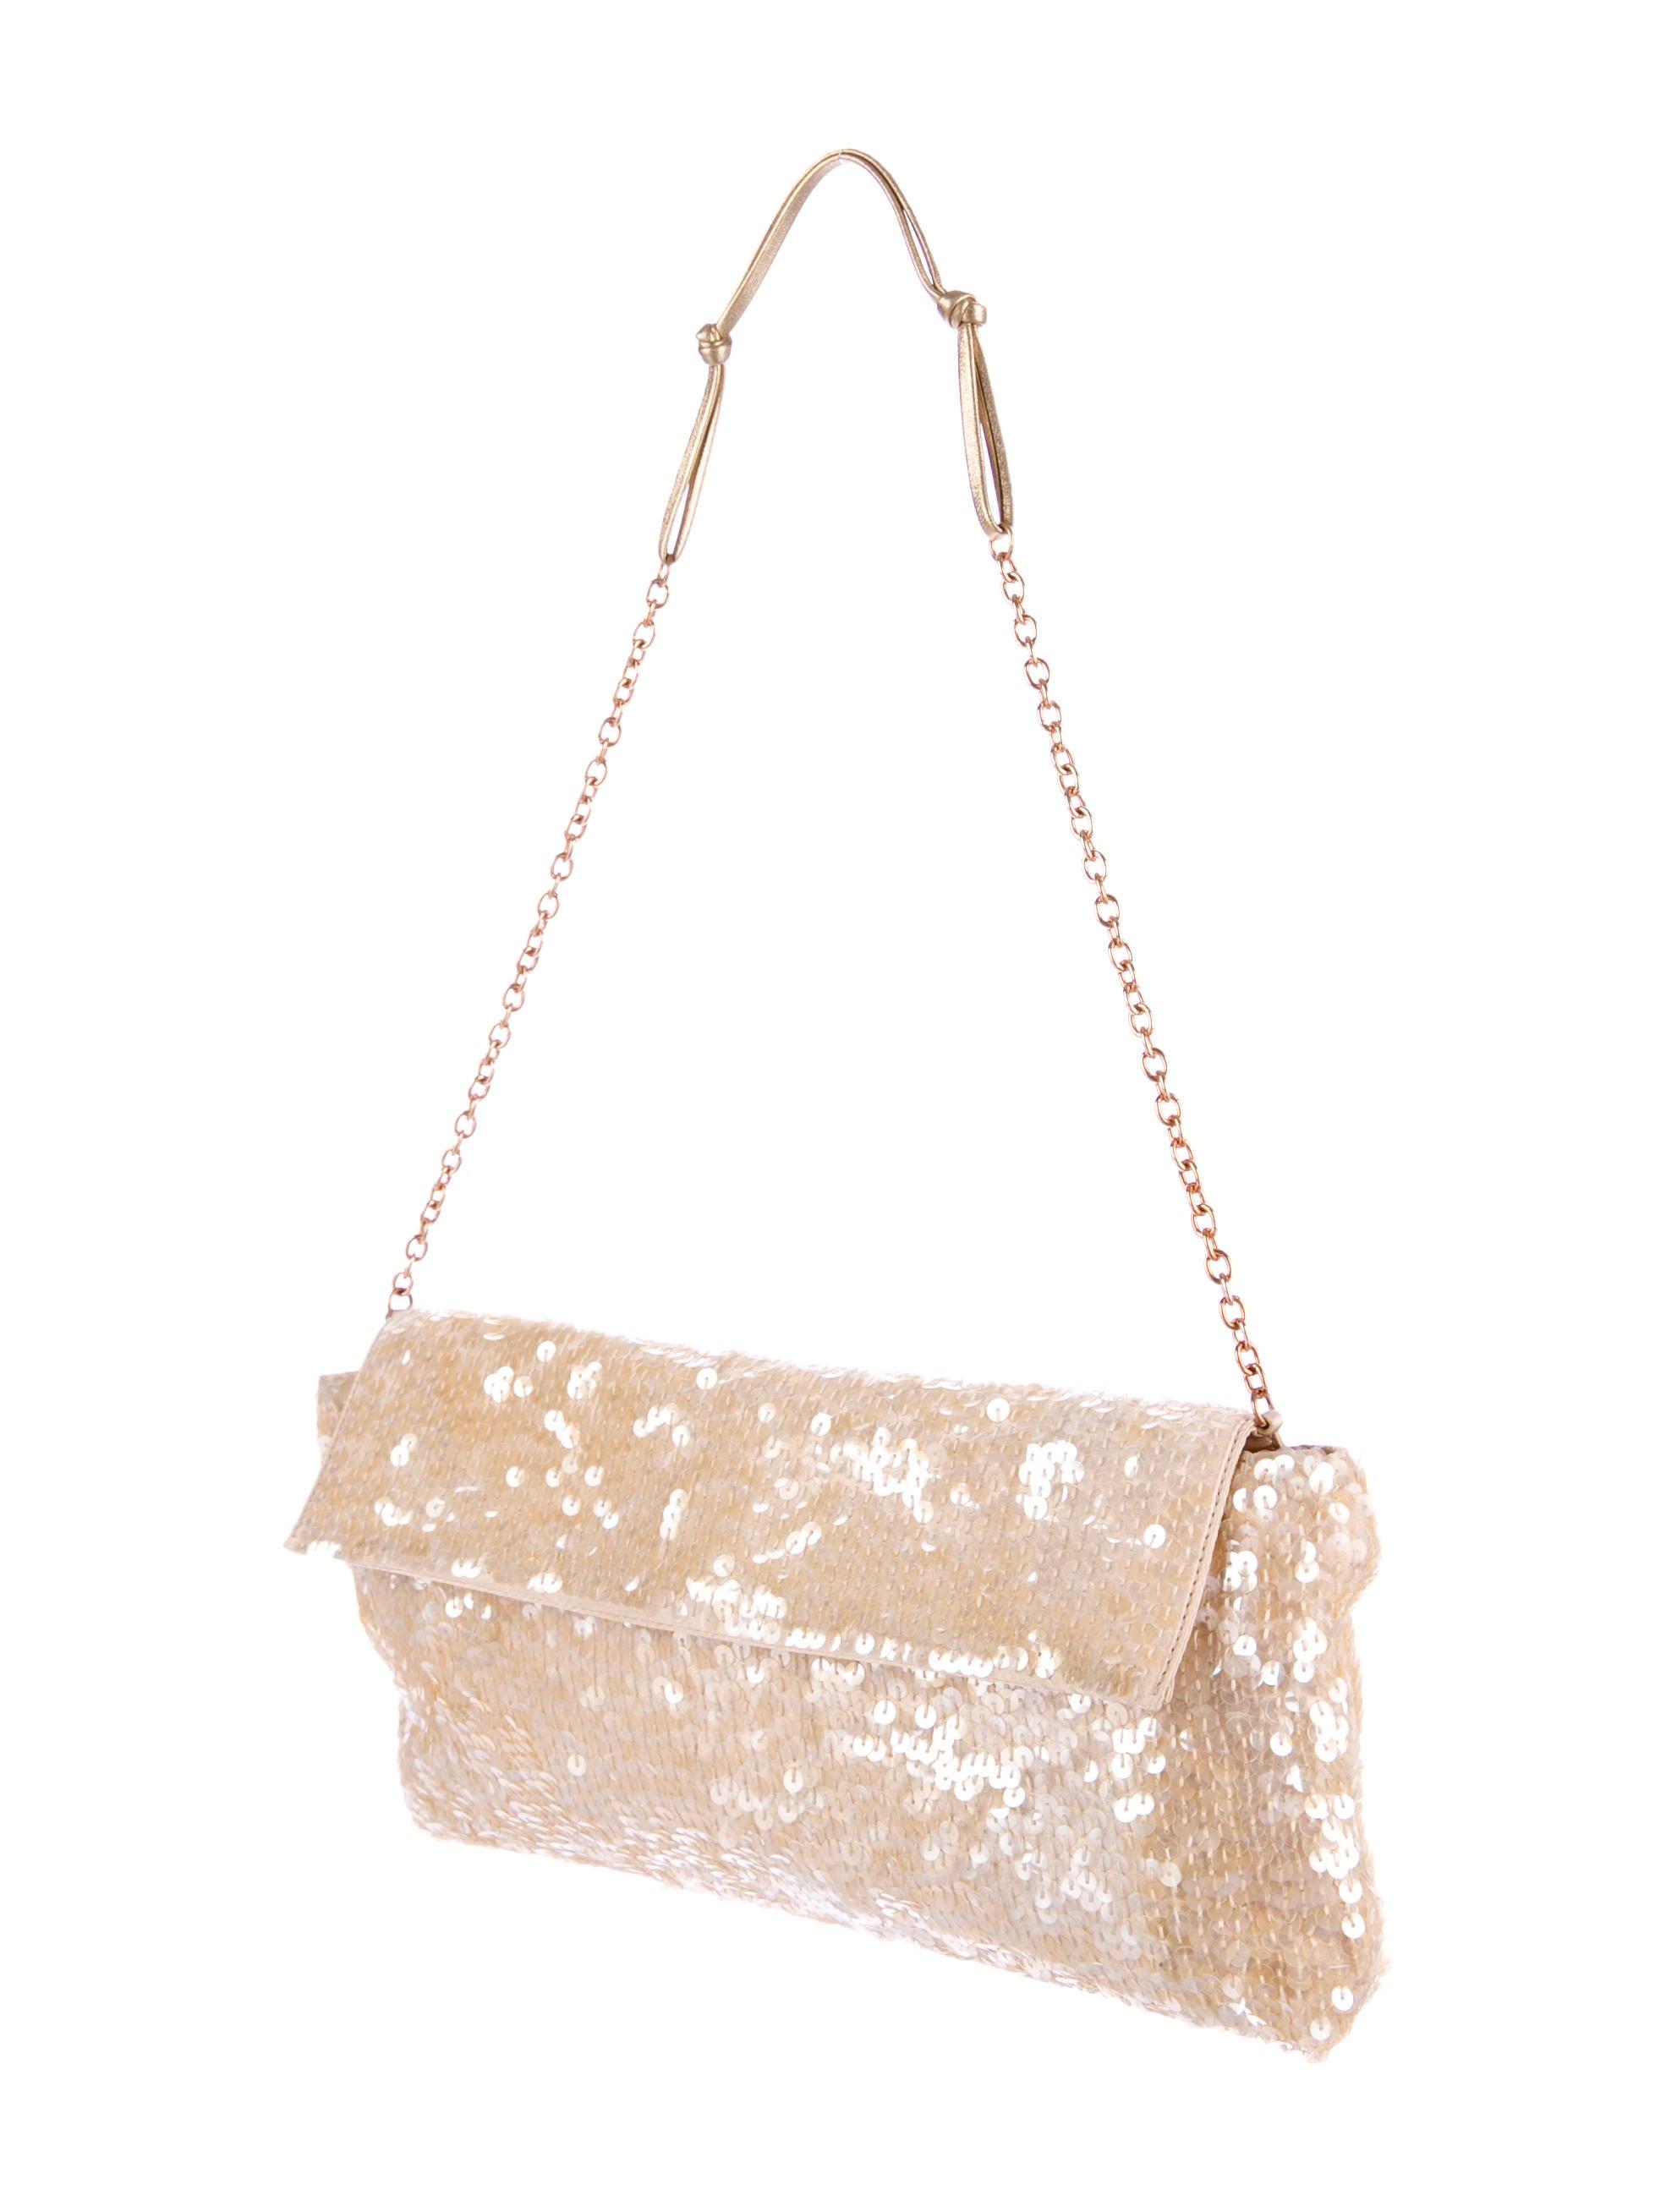 prada crocodile handbag - Prada Paillettes Evening Bag - Handbags - PRA84017   The RealReal